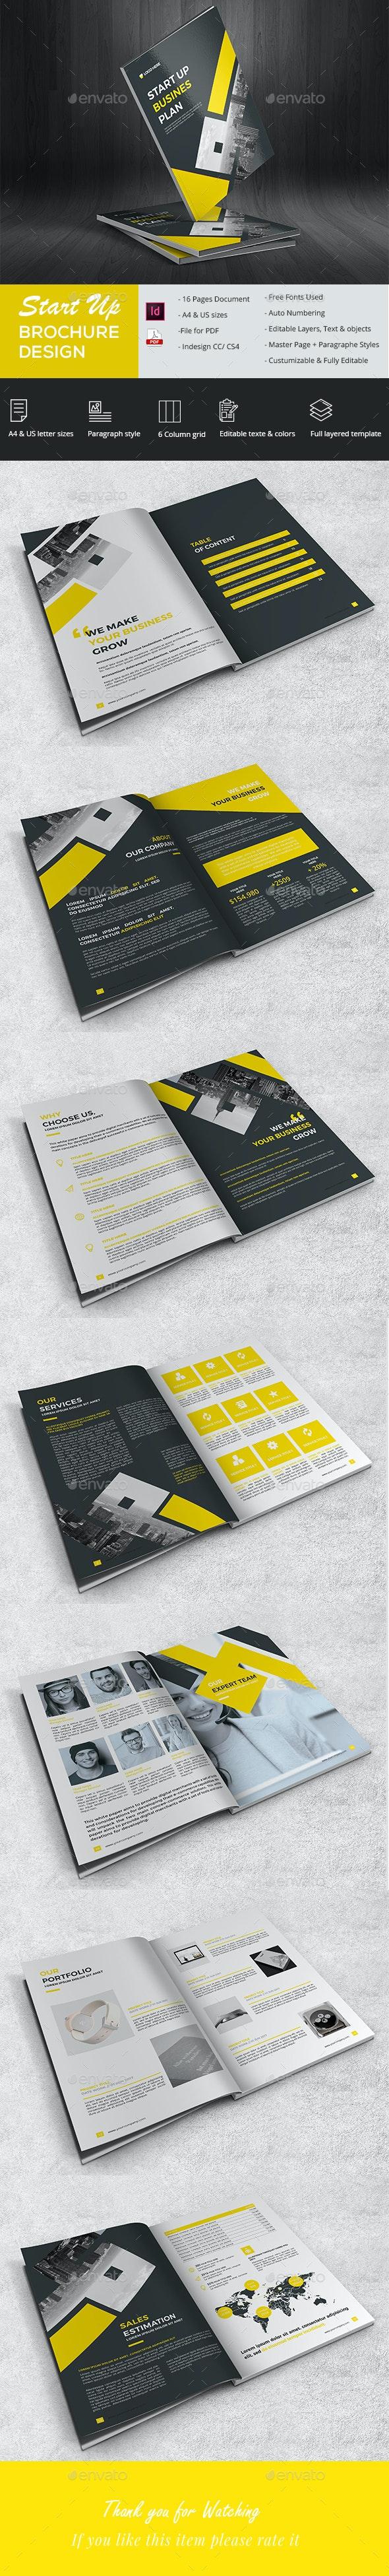 Stylish Startup Brochure - Corporate Brochures